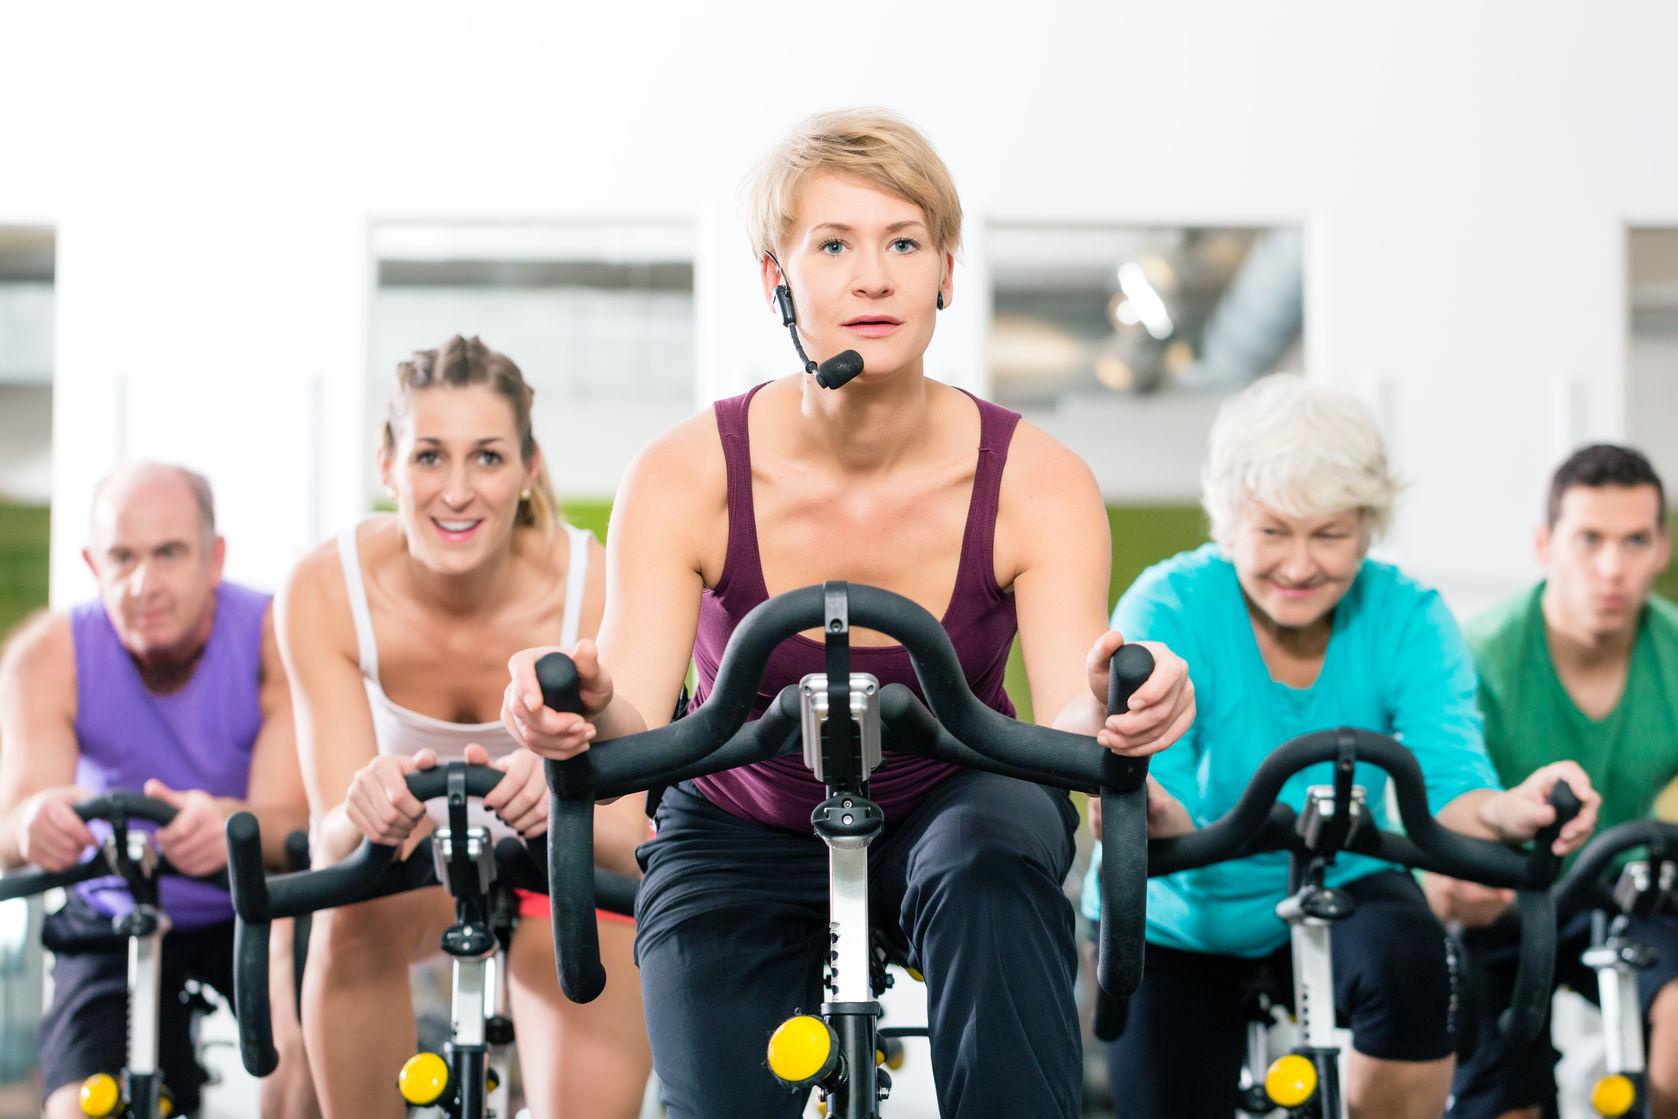 Istruttore fitness